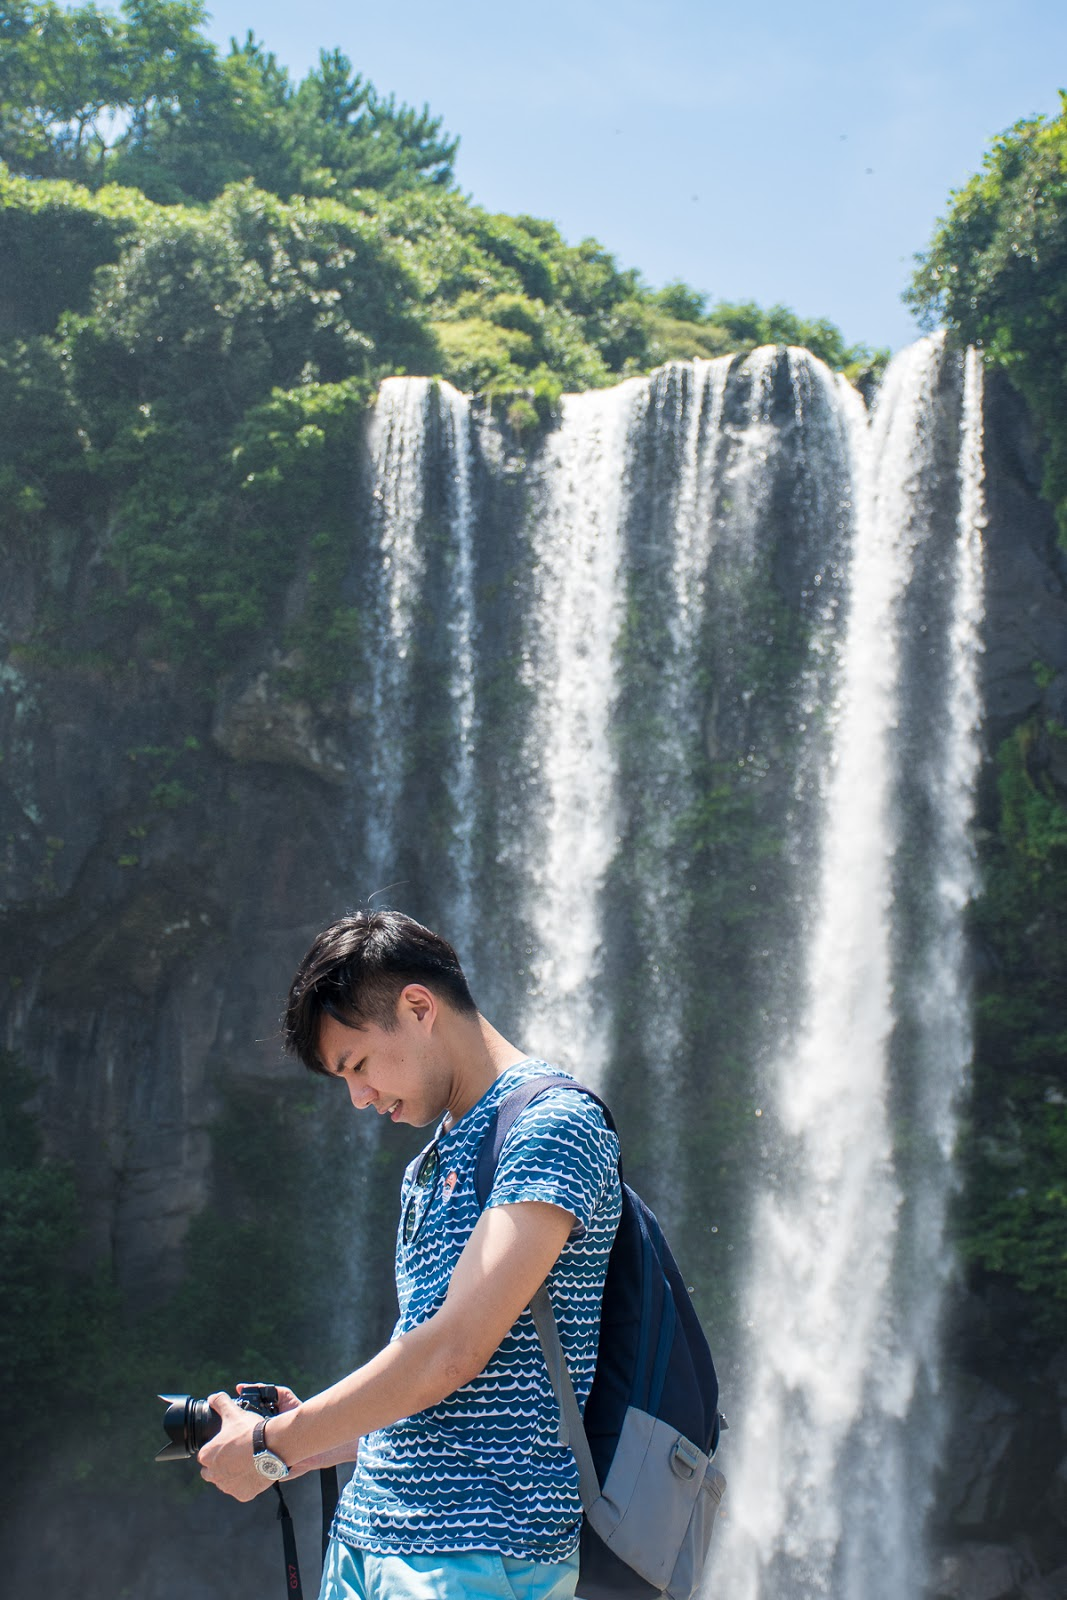 jeonbang waterfalls image and pictures of jeju korea